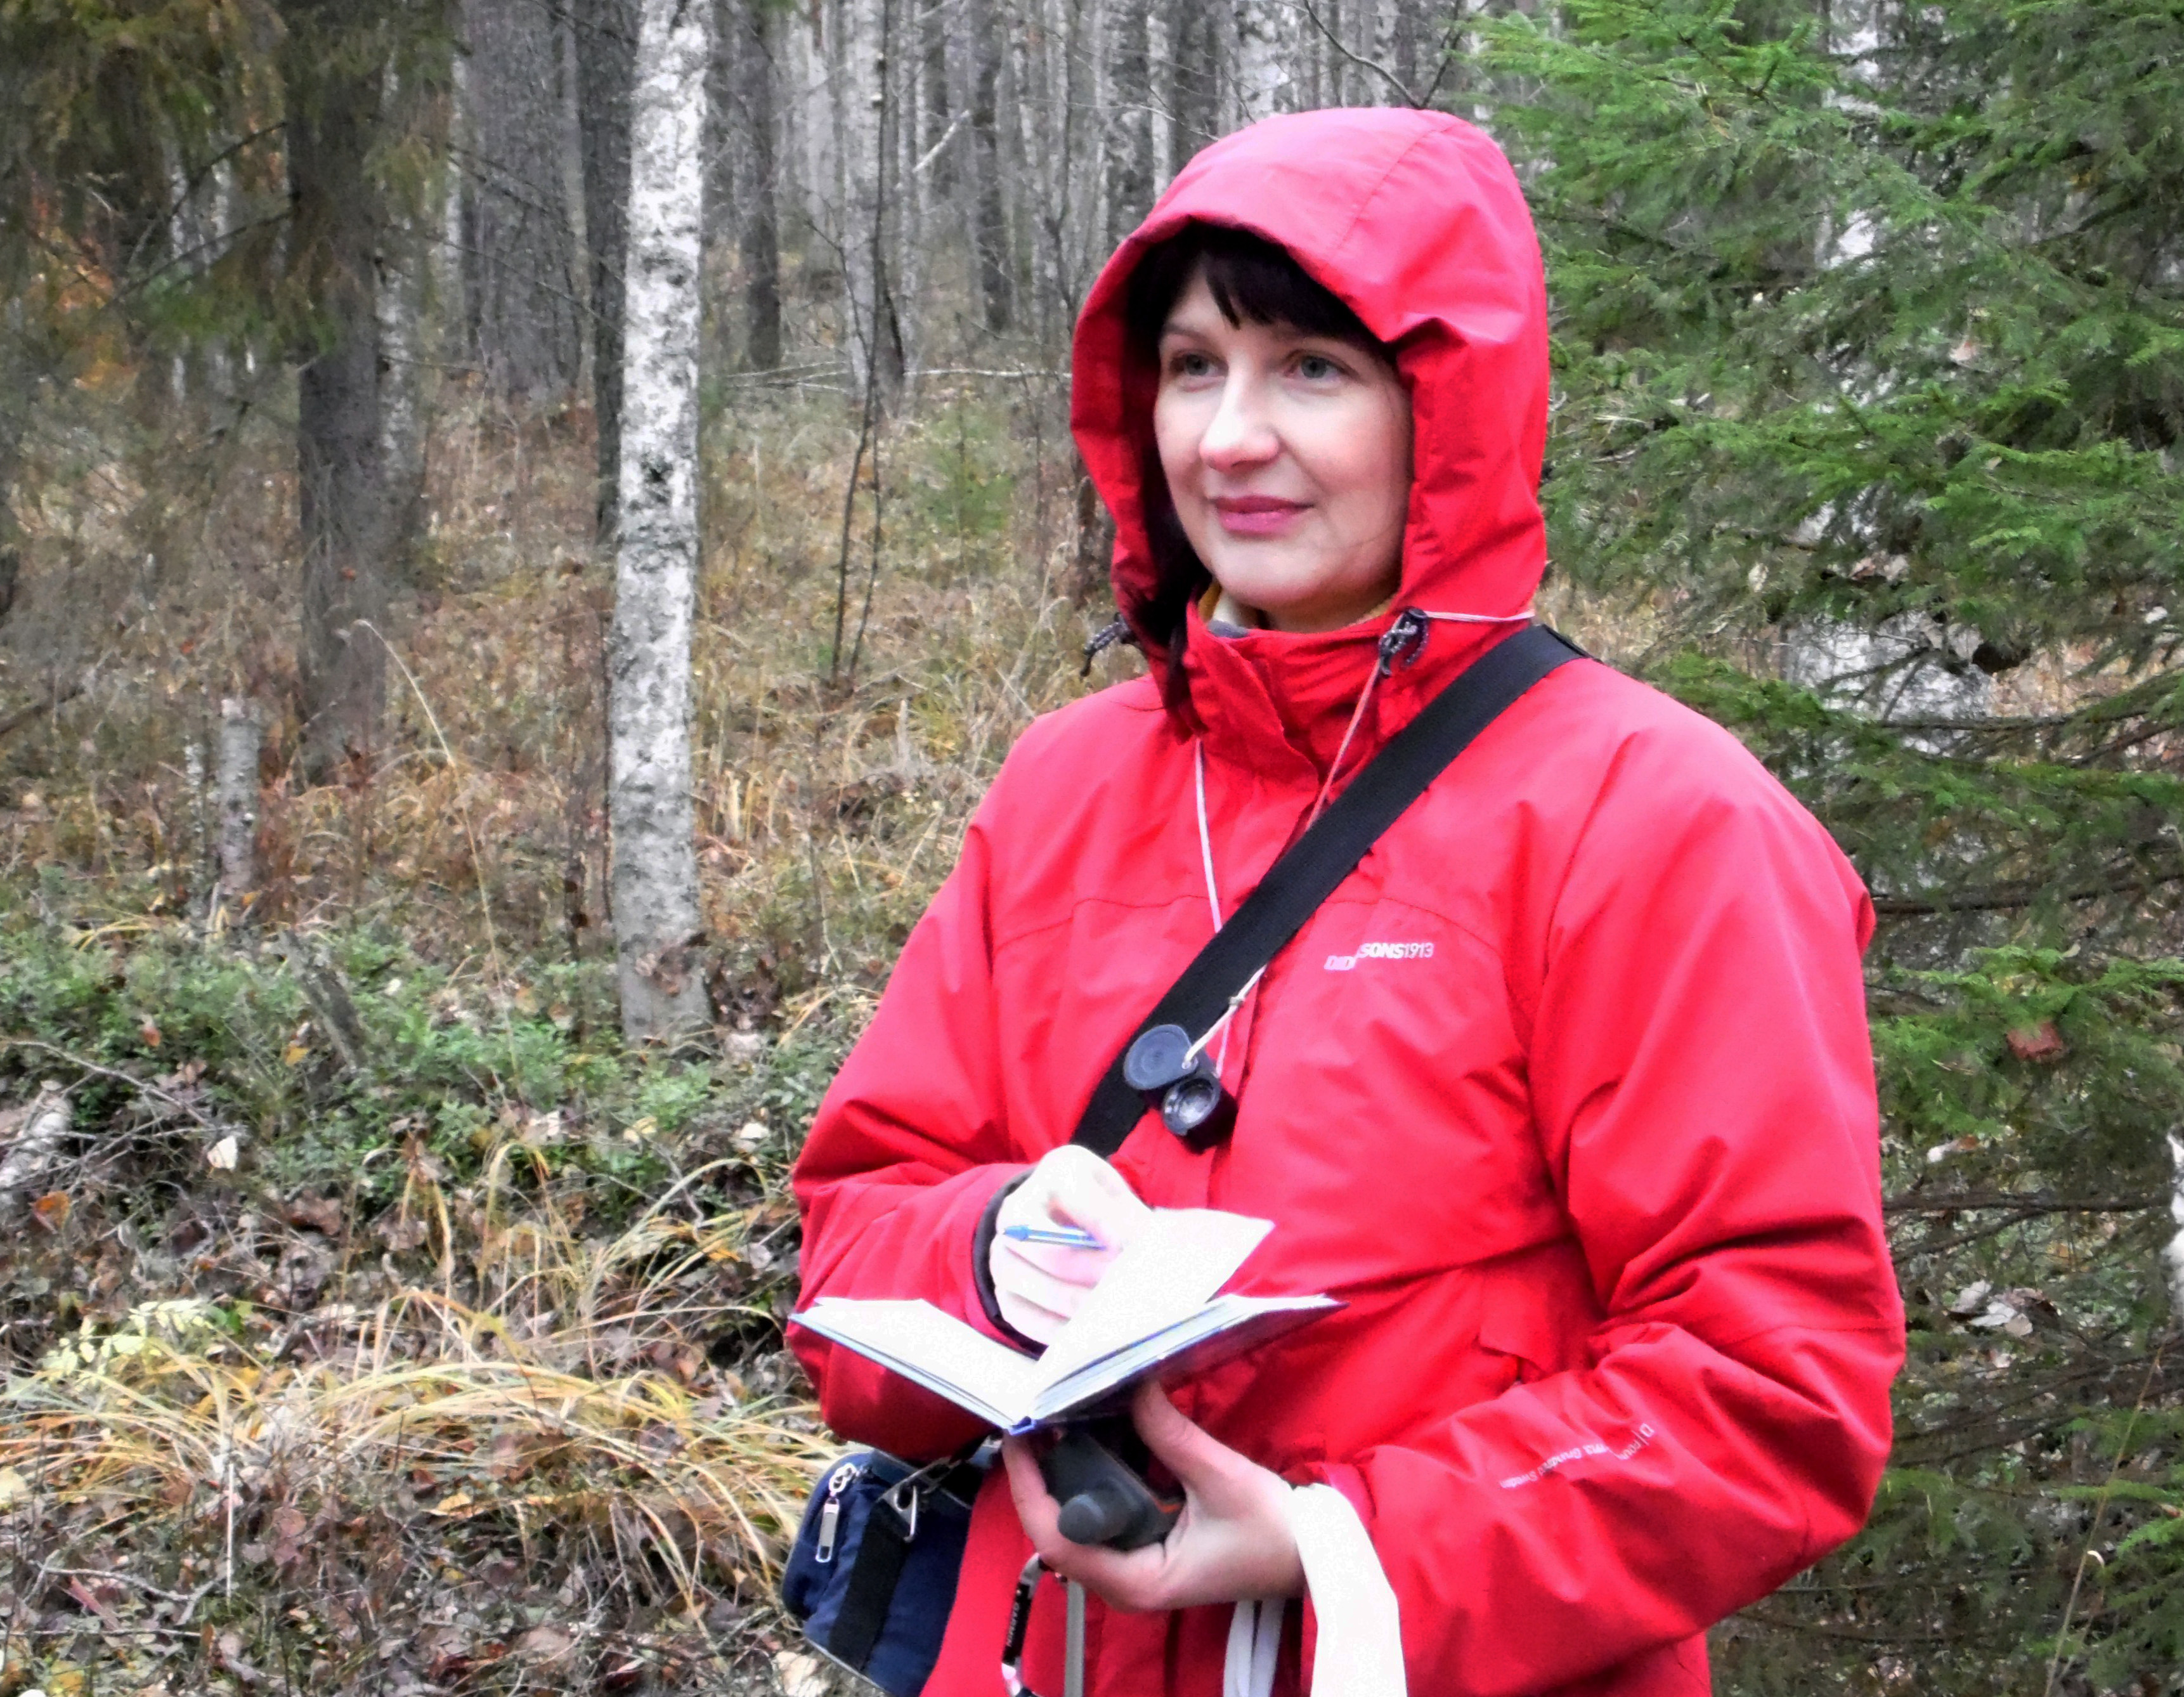 Виктория Тарасова. Фото: Алексей Владимиров